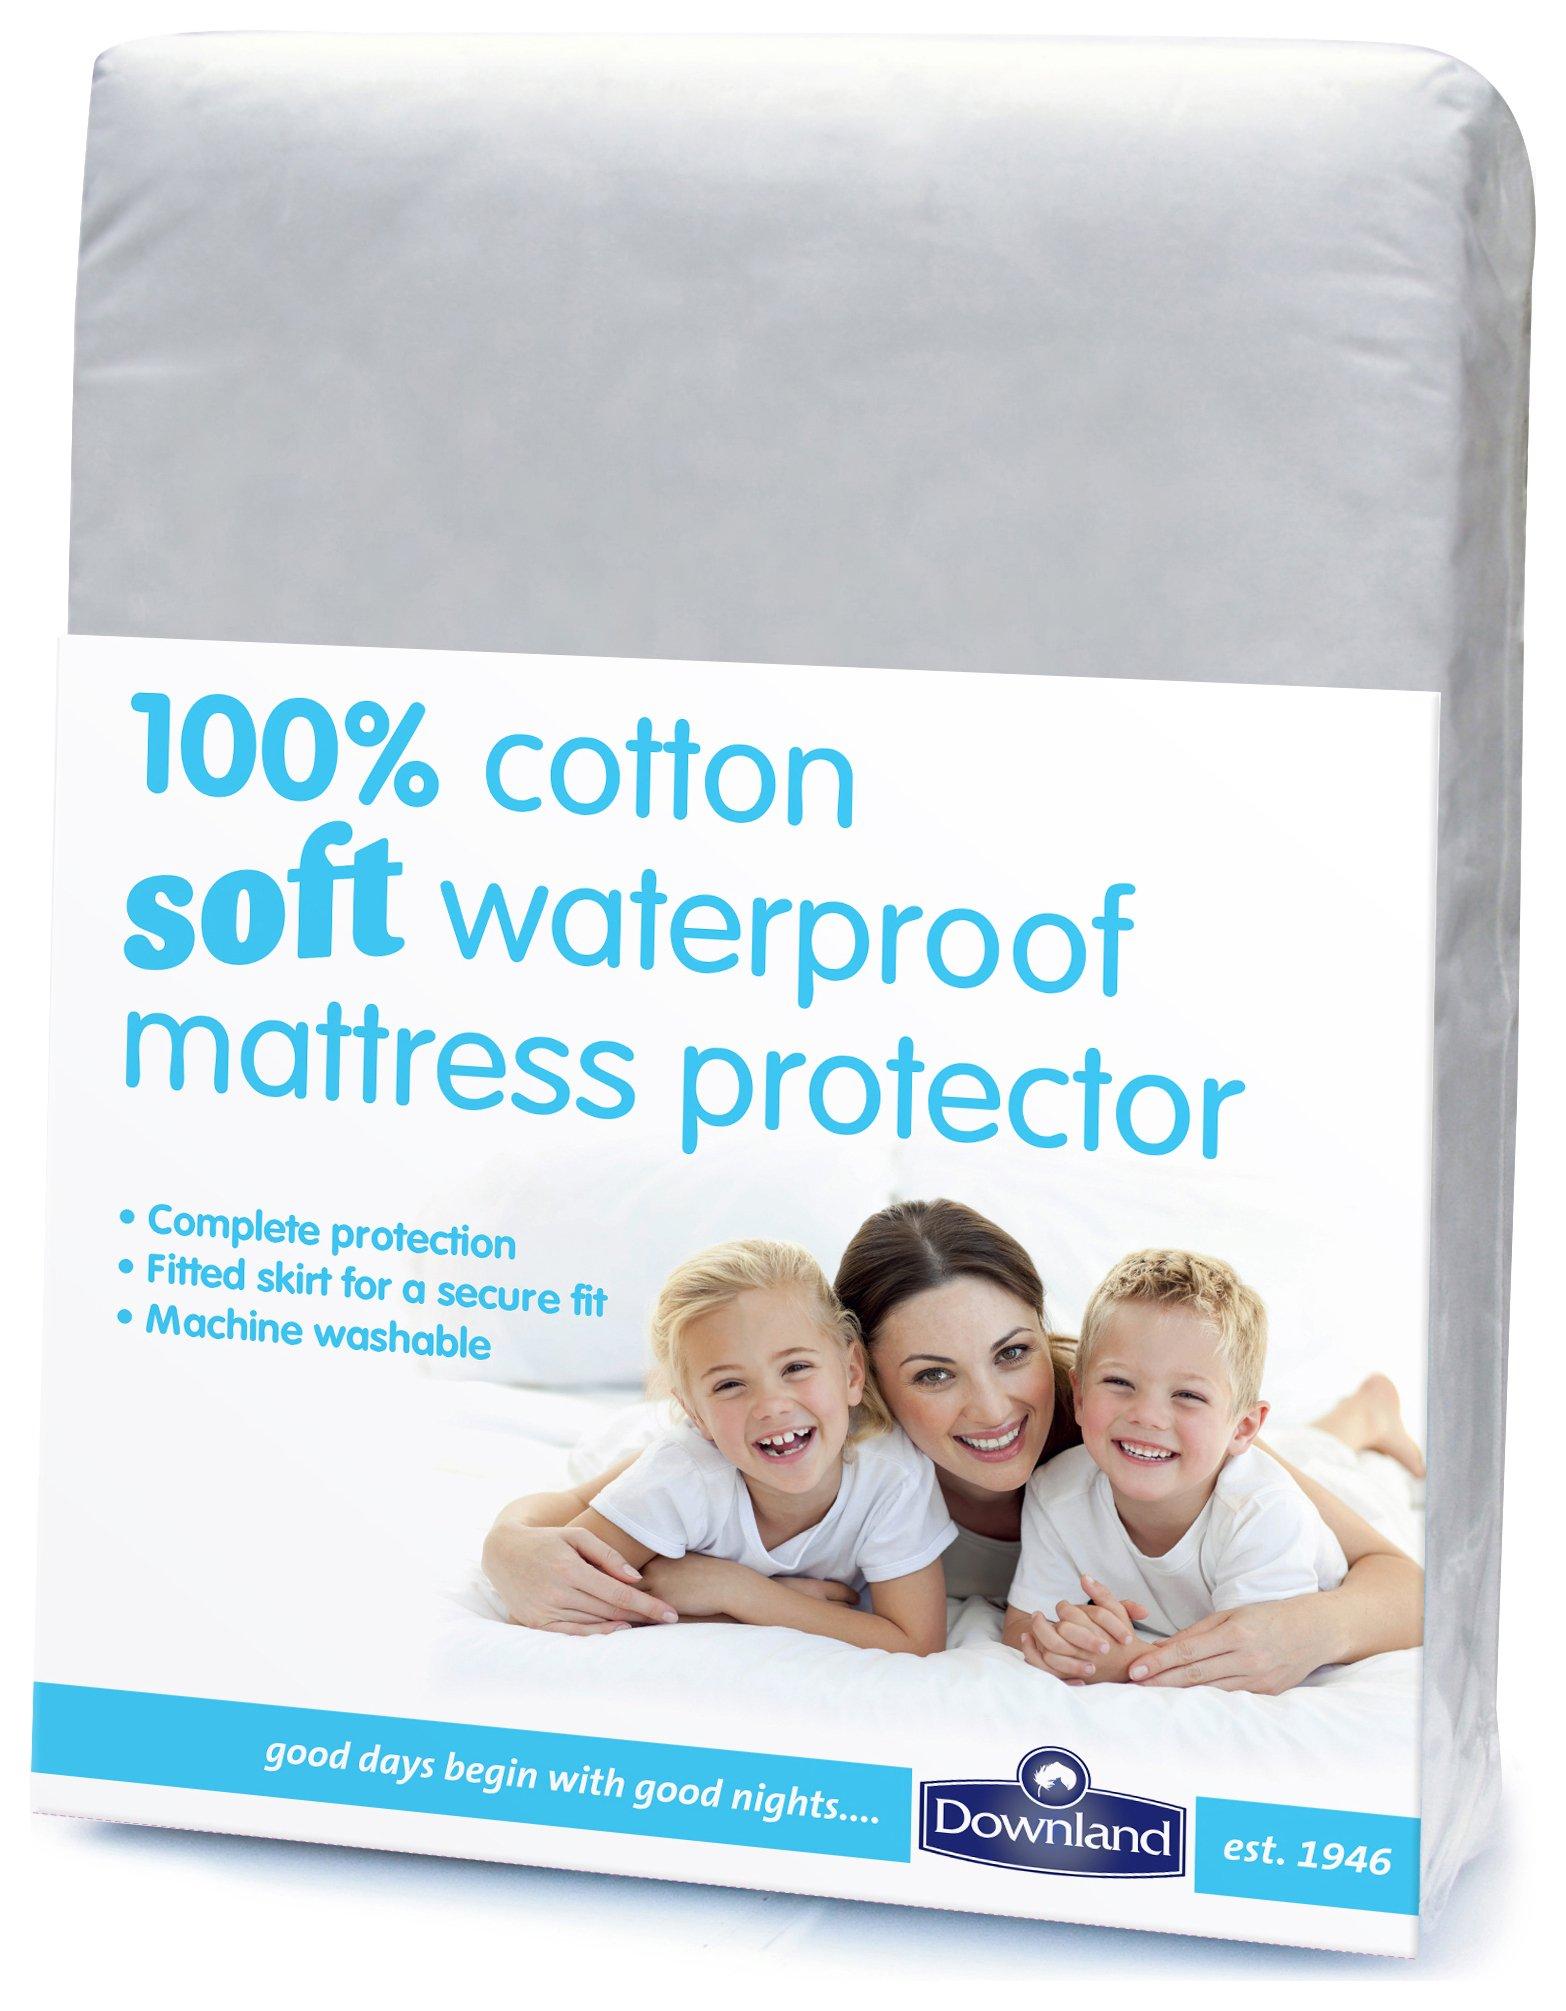 Downland Cotton Soft Waterproof Mattress Protector - Double